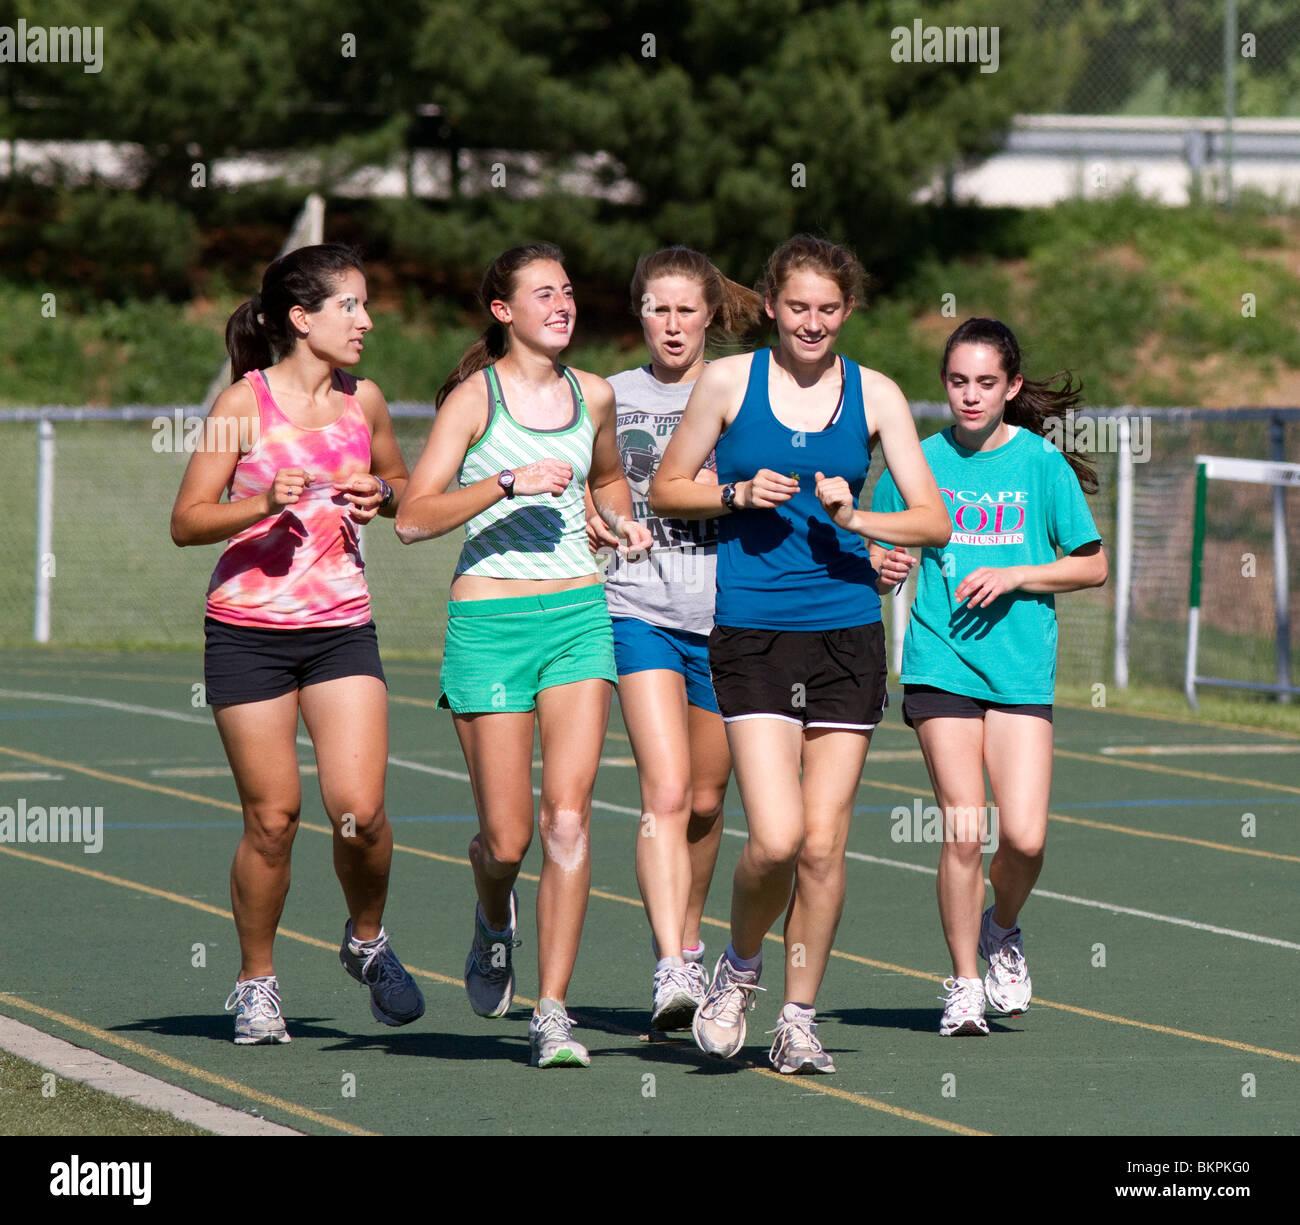 Teen track girls